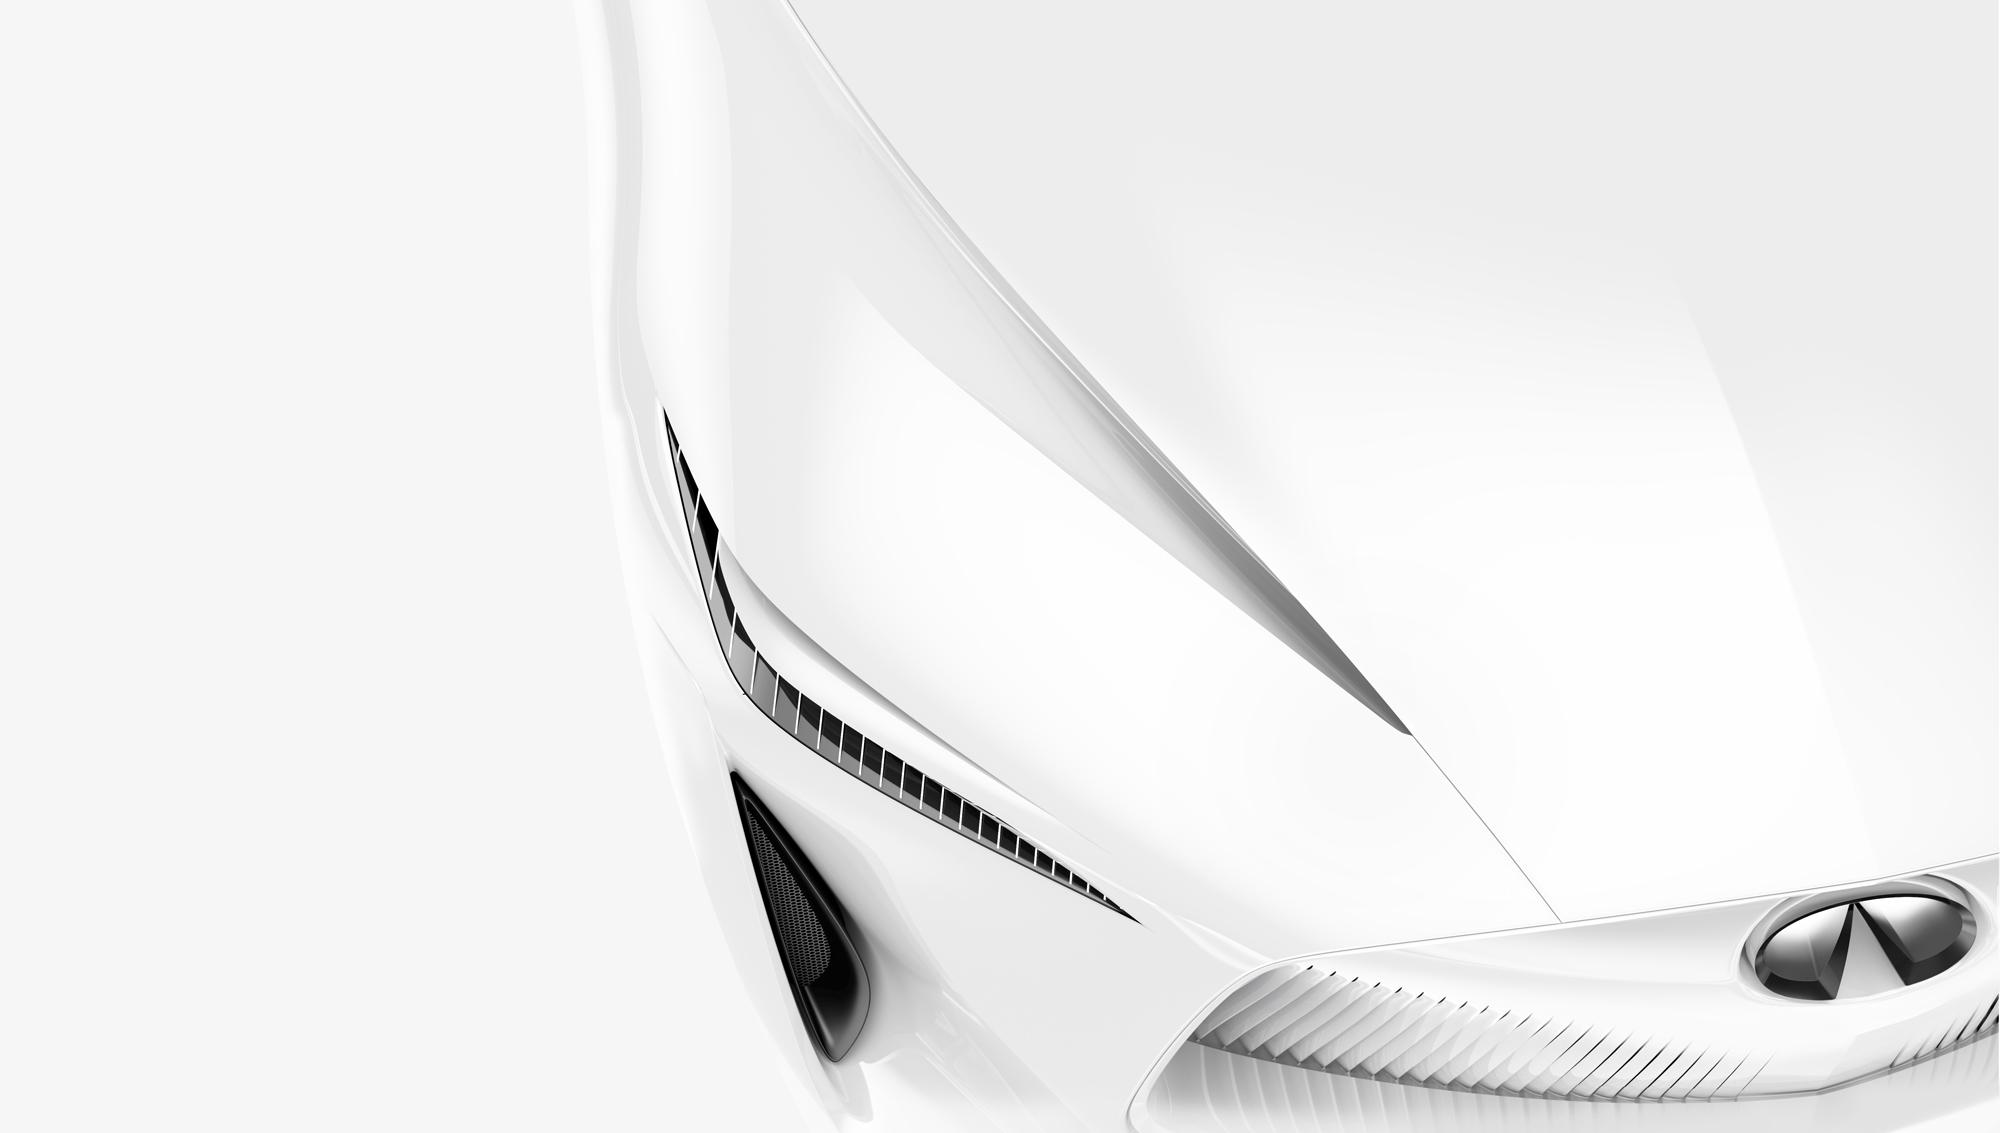 Infiniti Concept Car Teaser